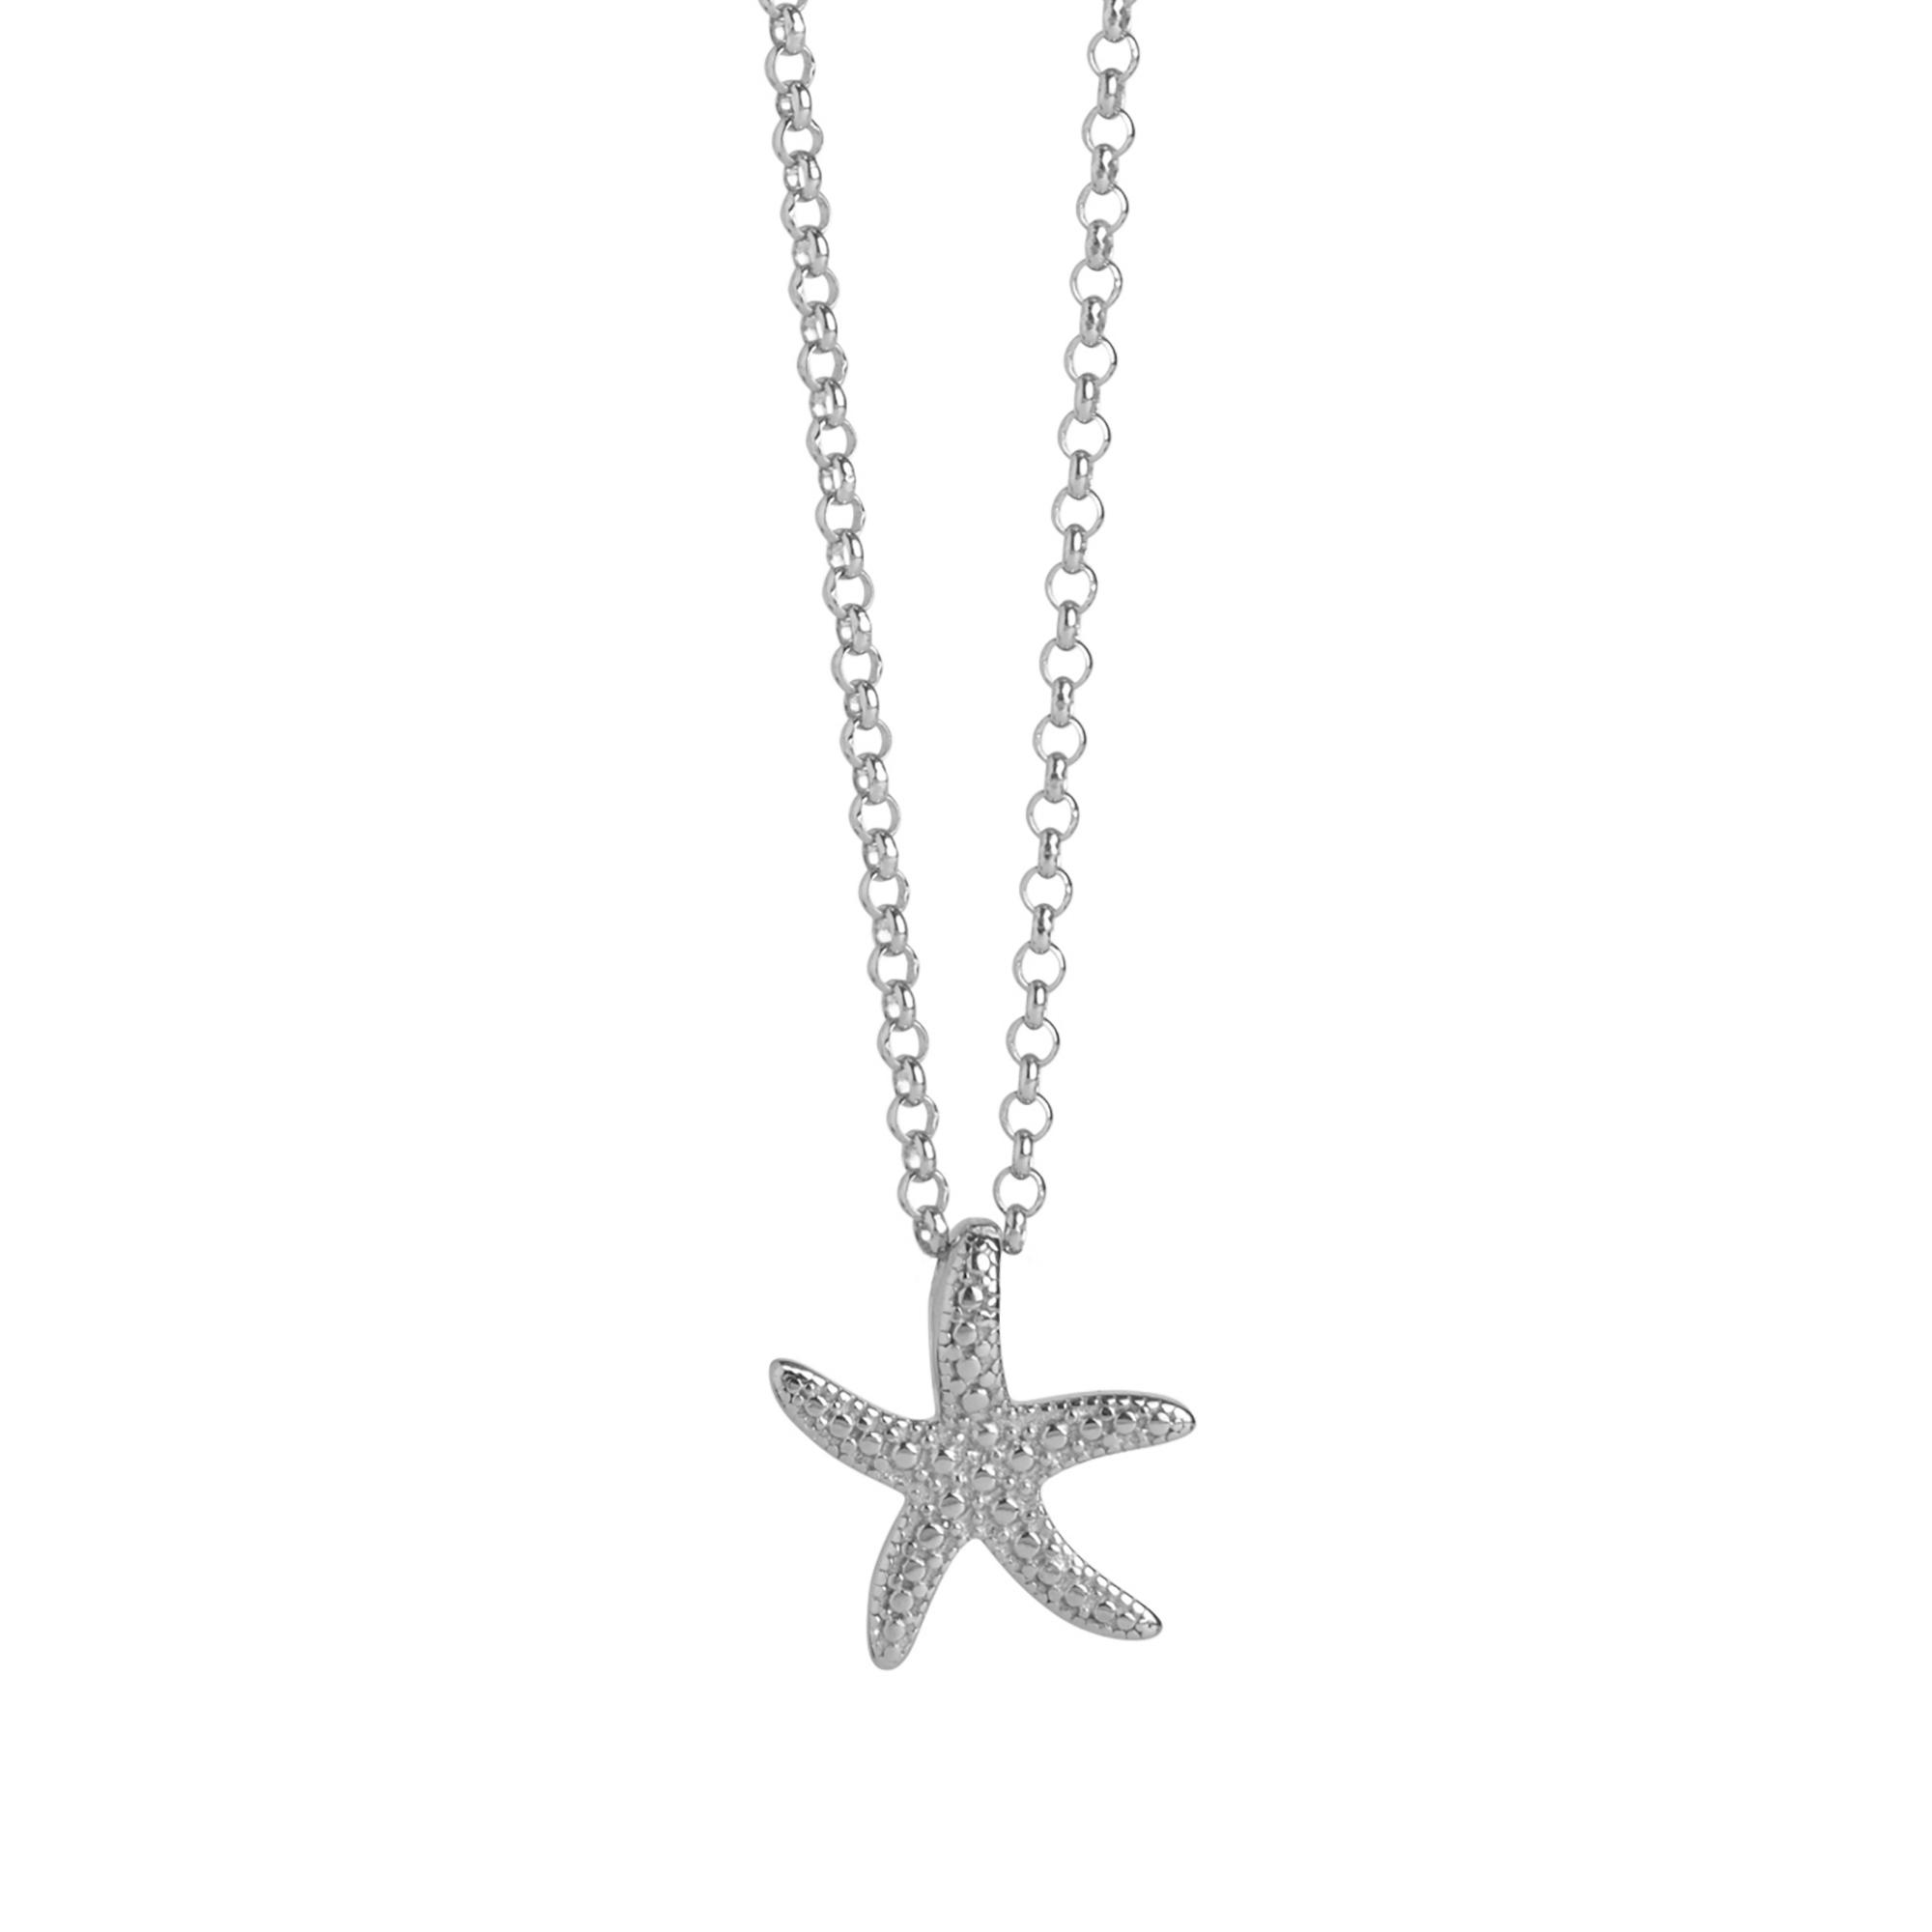 Muru Starfish Charm Necklace Silver